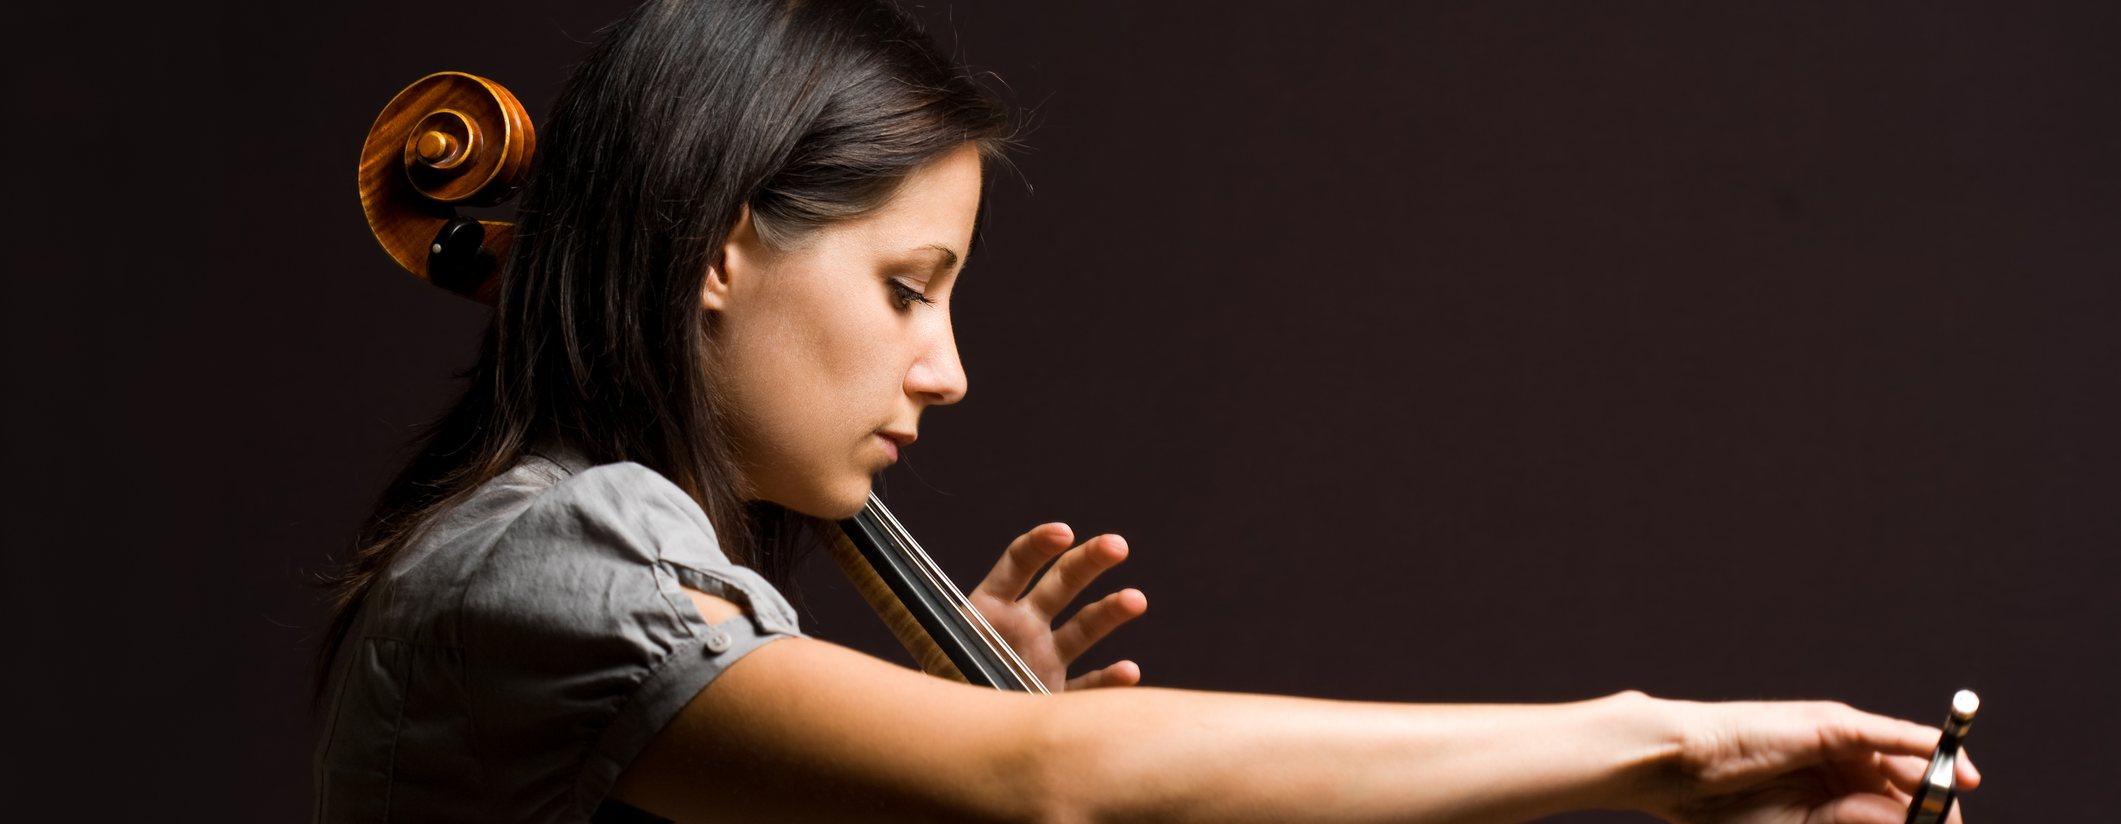 Girl playing cello.